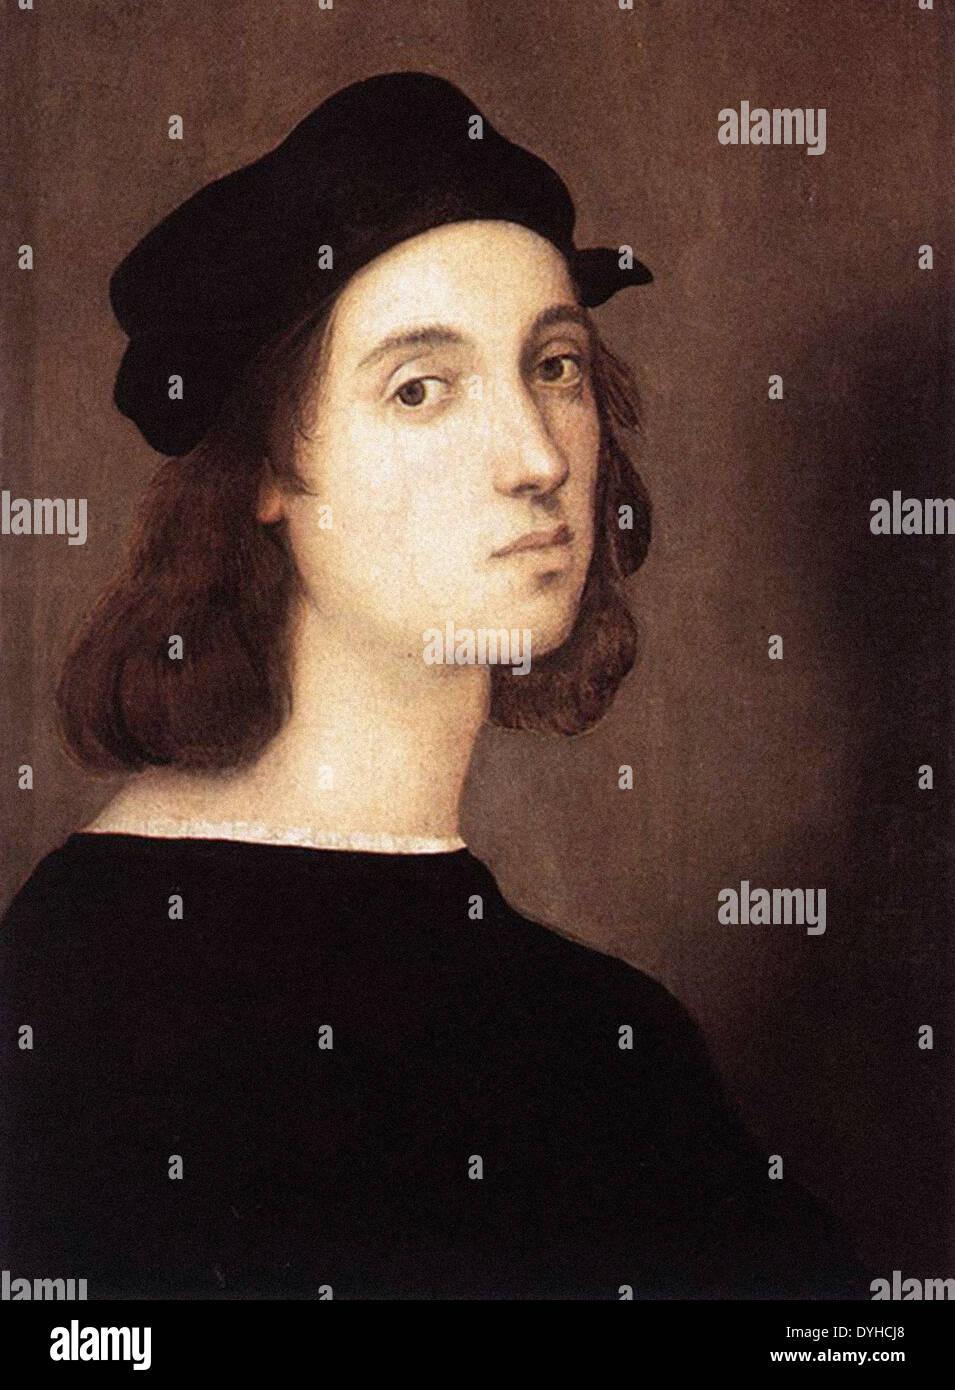 Raphael Self Portrait - Stock Image